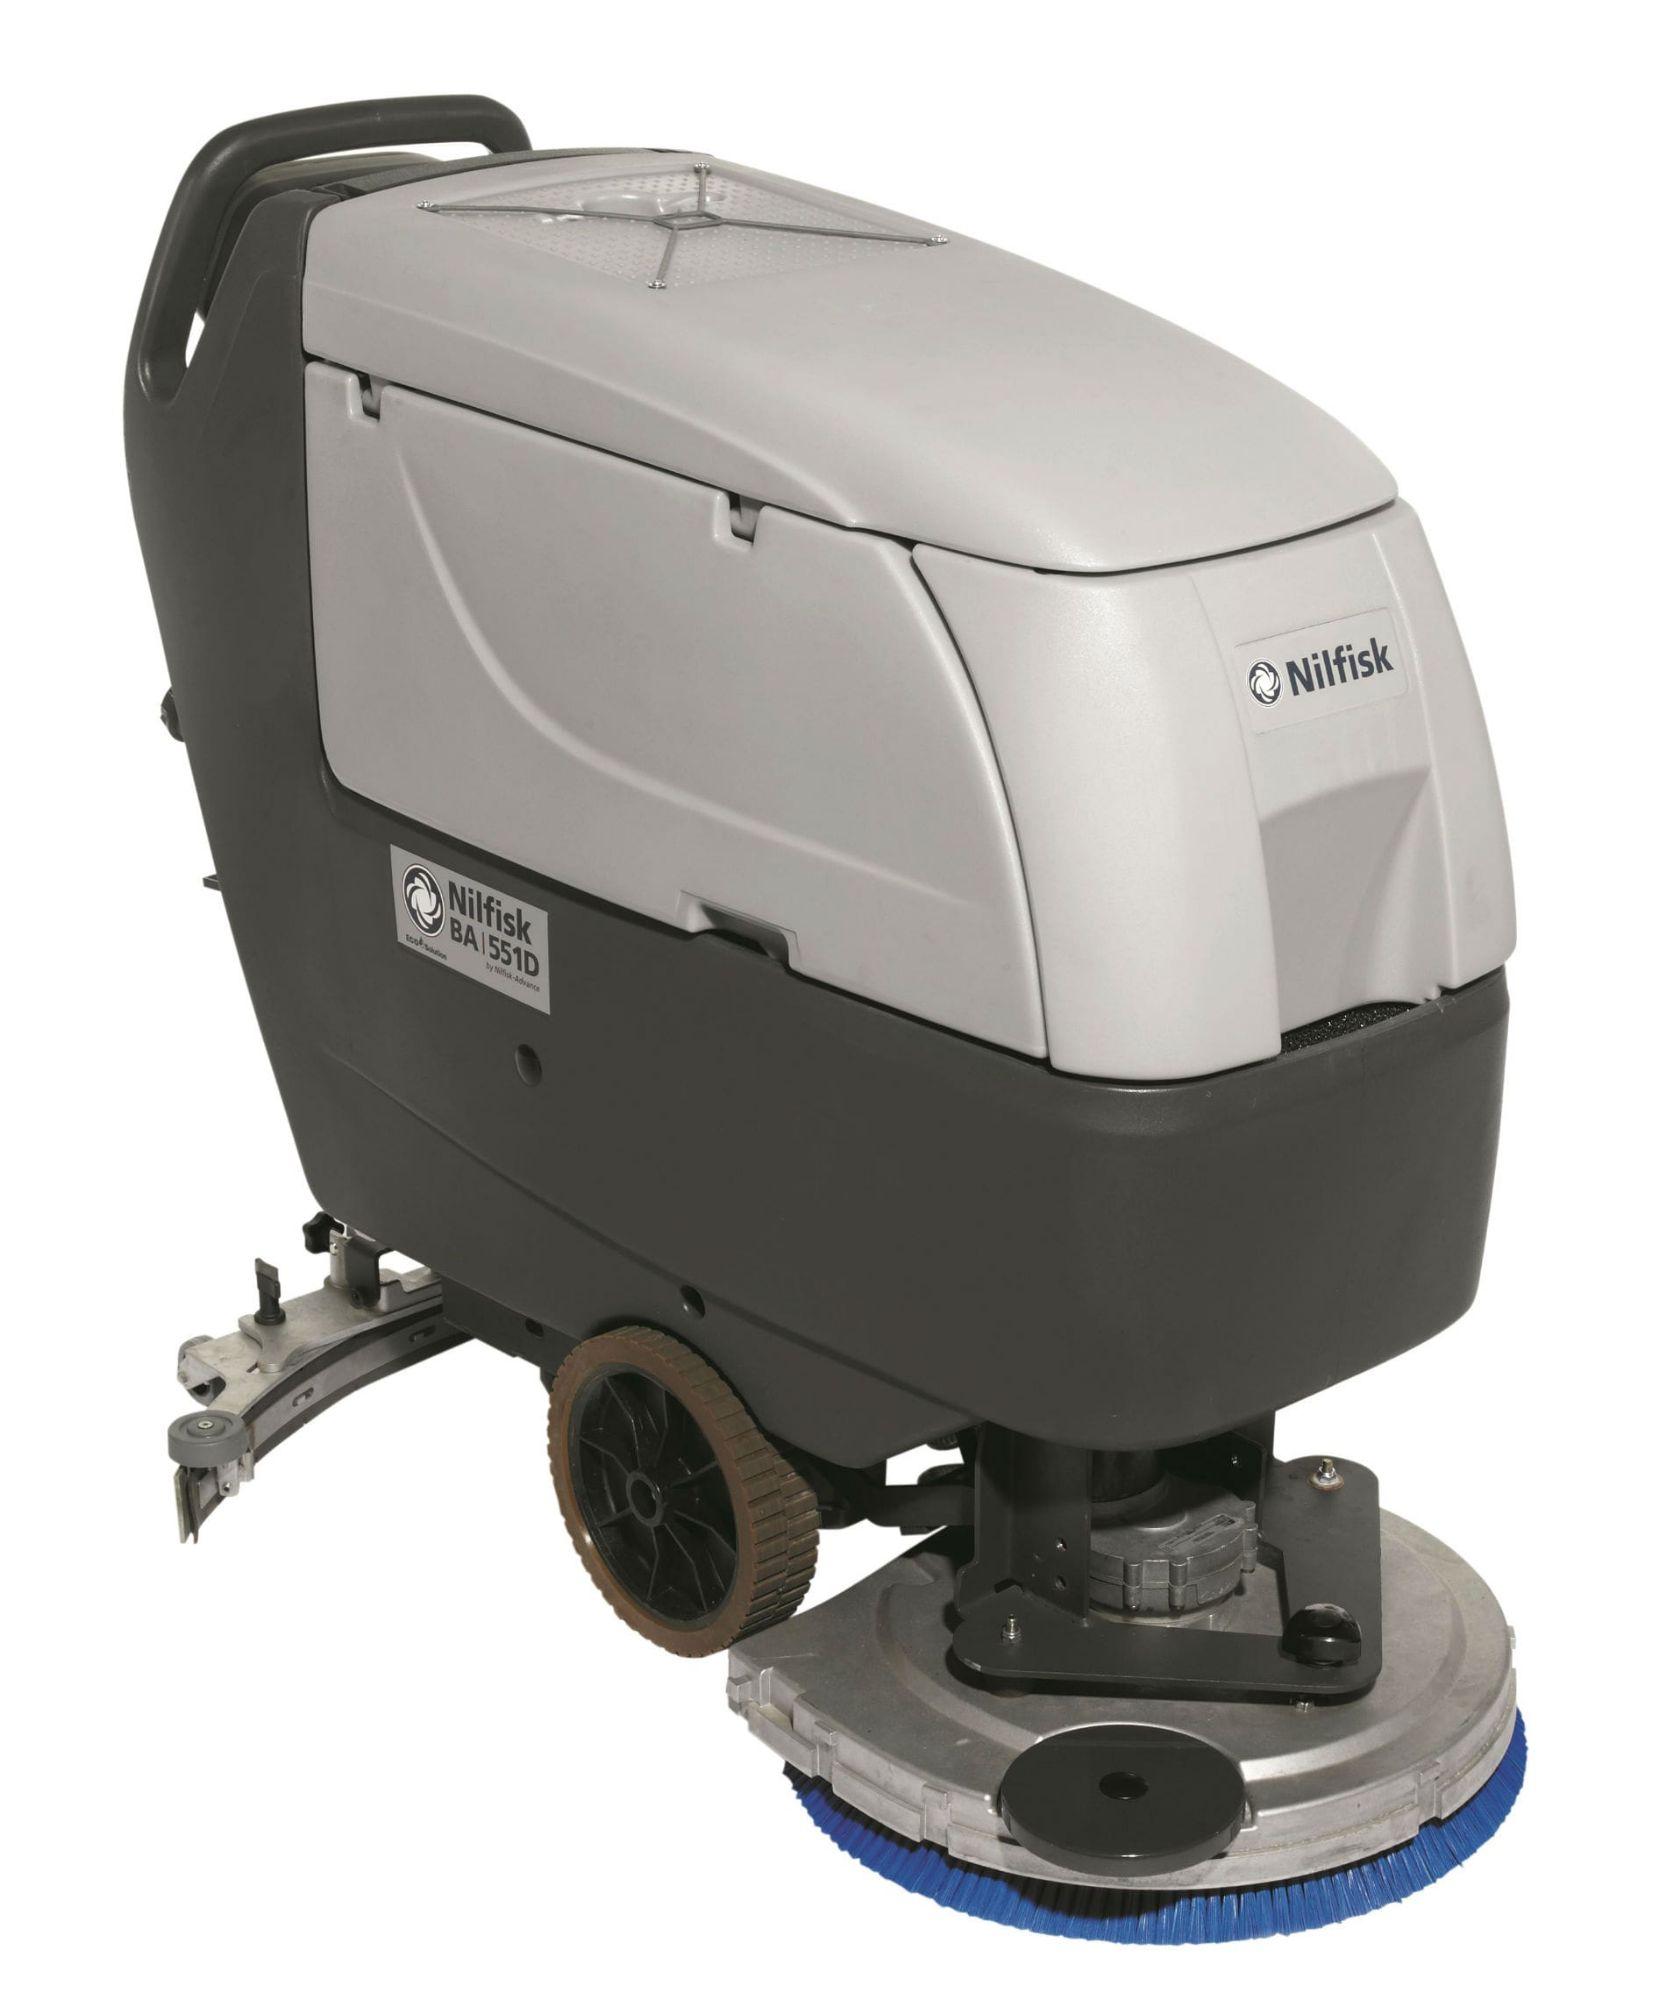 Nilfisk BA 551/611 Pedestrian Scrubber Dryer